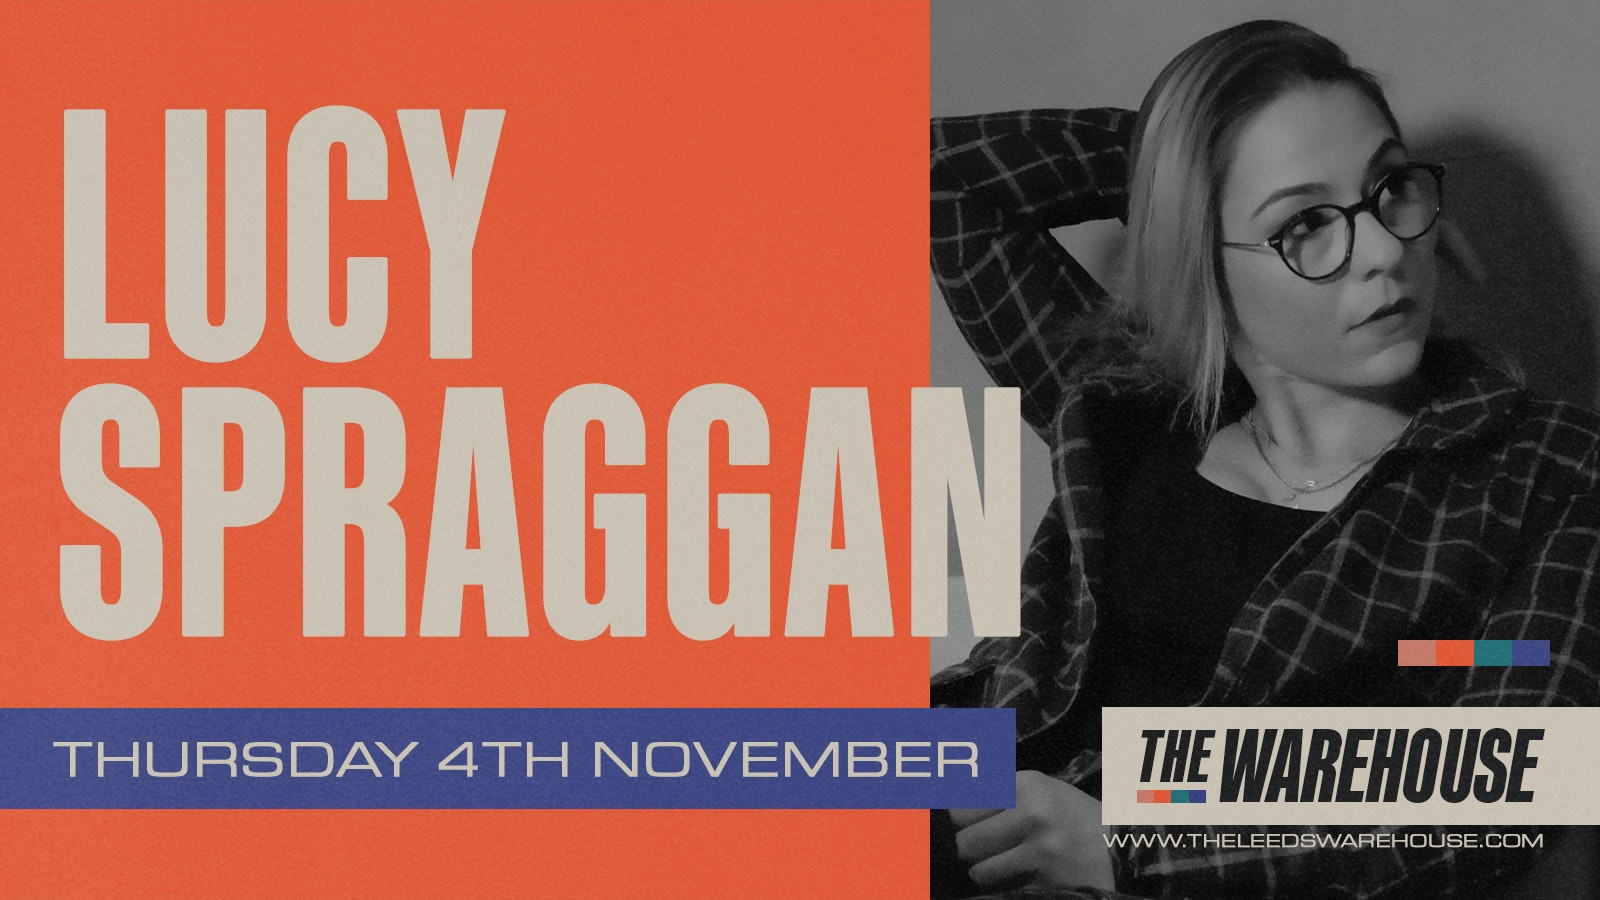 Lucy Spraggan – Live